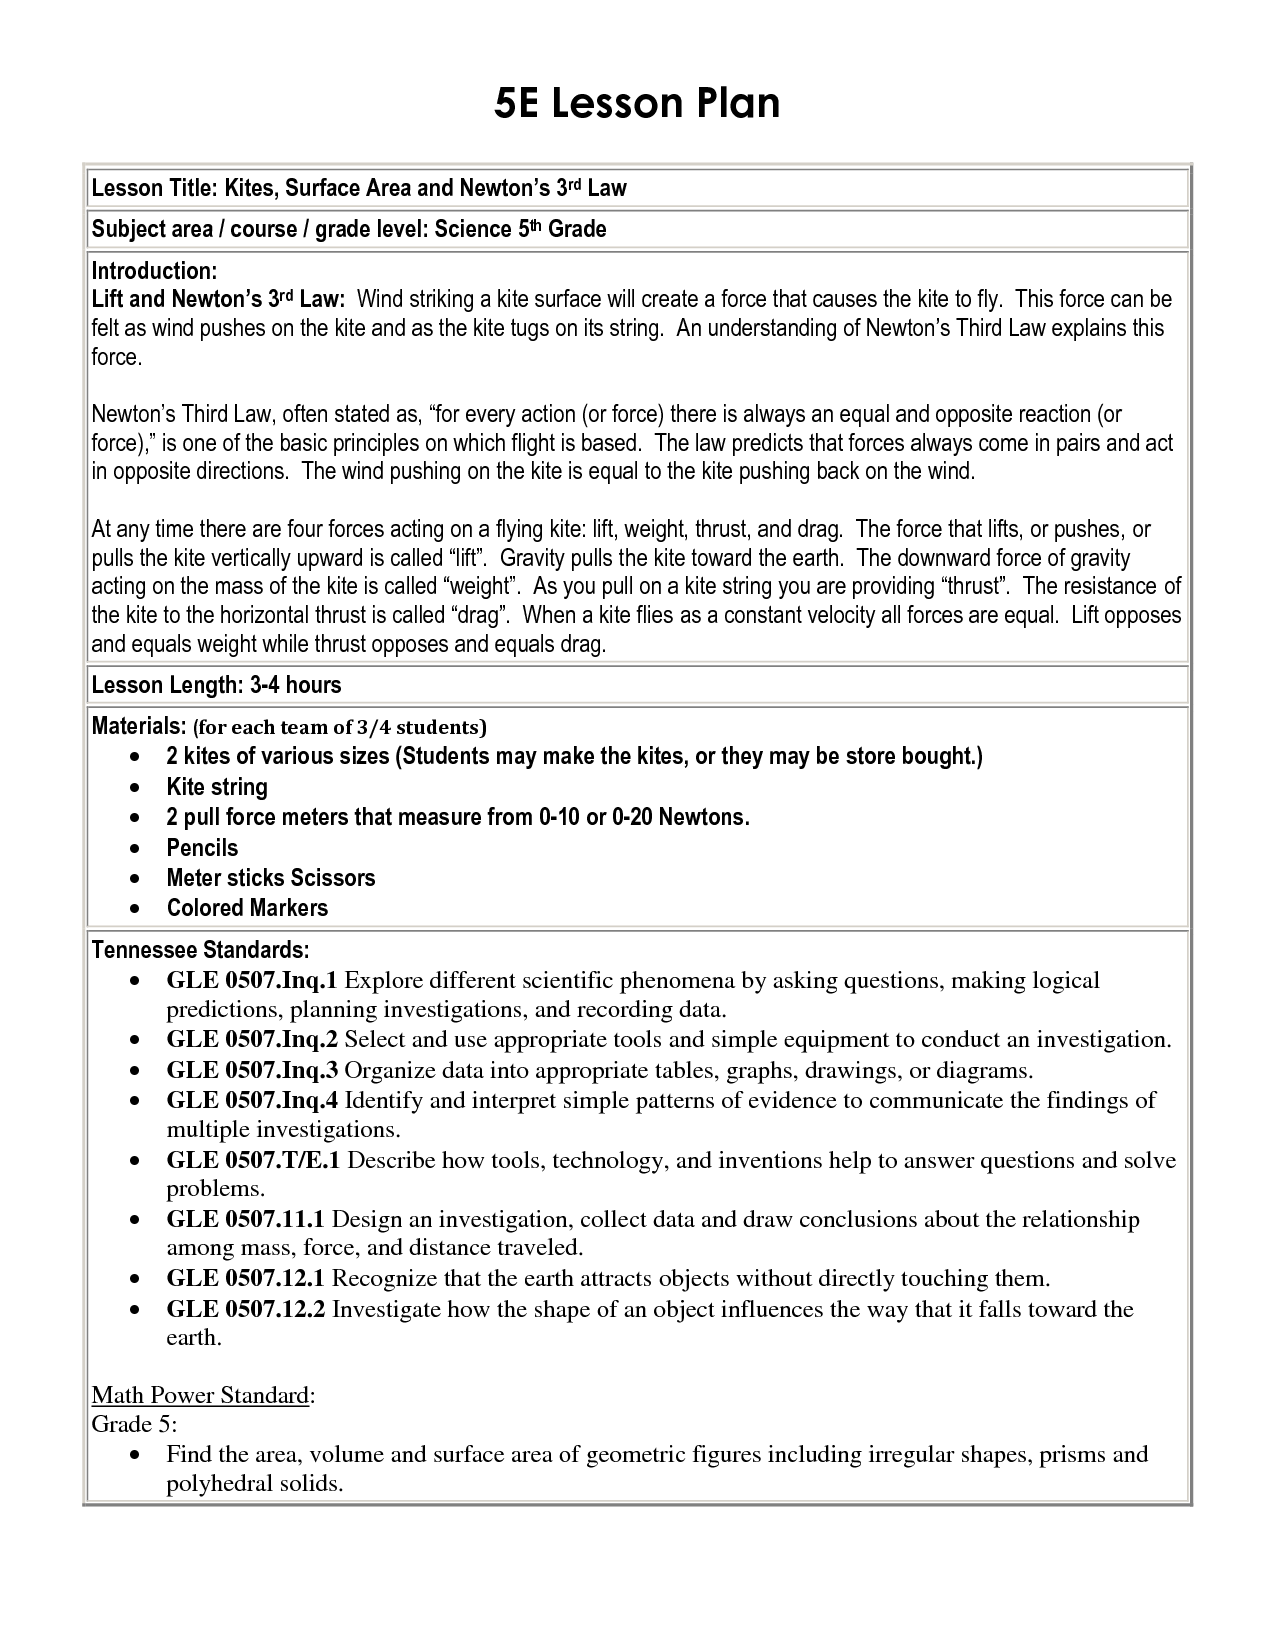 worksheet States Of Matter Worksheet High School 5 e lesson plan template 5e school template